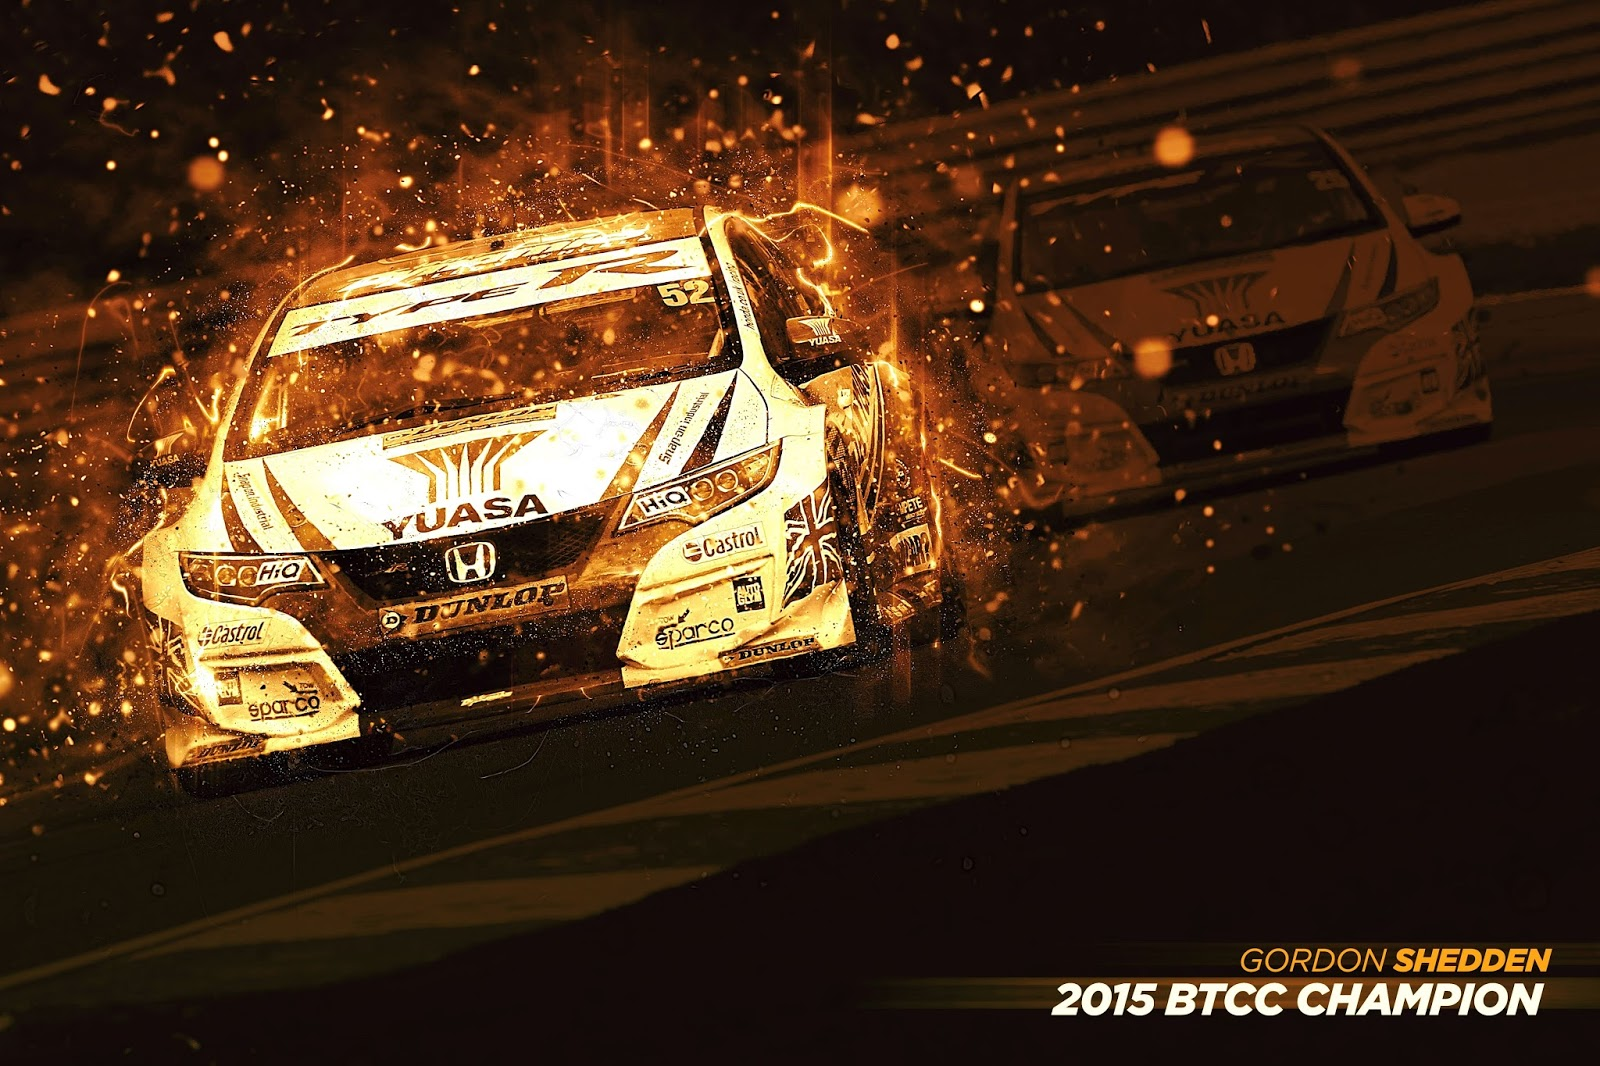 BTCC 2015 Champions Banner v4 min Η συλλογή τίτλων μόλις ξεκίνησε για το νέο Civic Type R BTCC, Hatcback, Honda, Honda Civic, Honda Civic Type R, Rally, videos